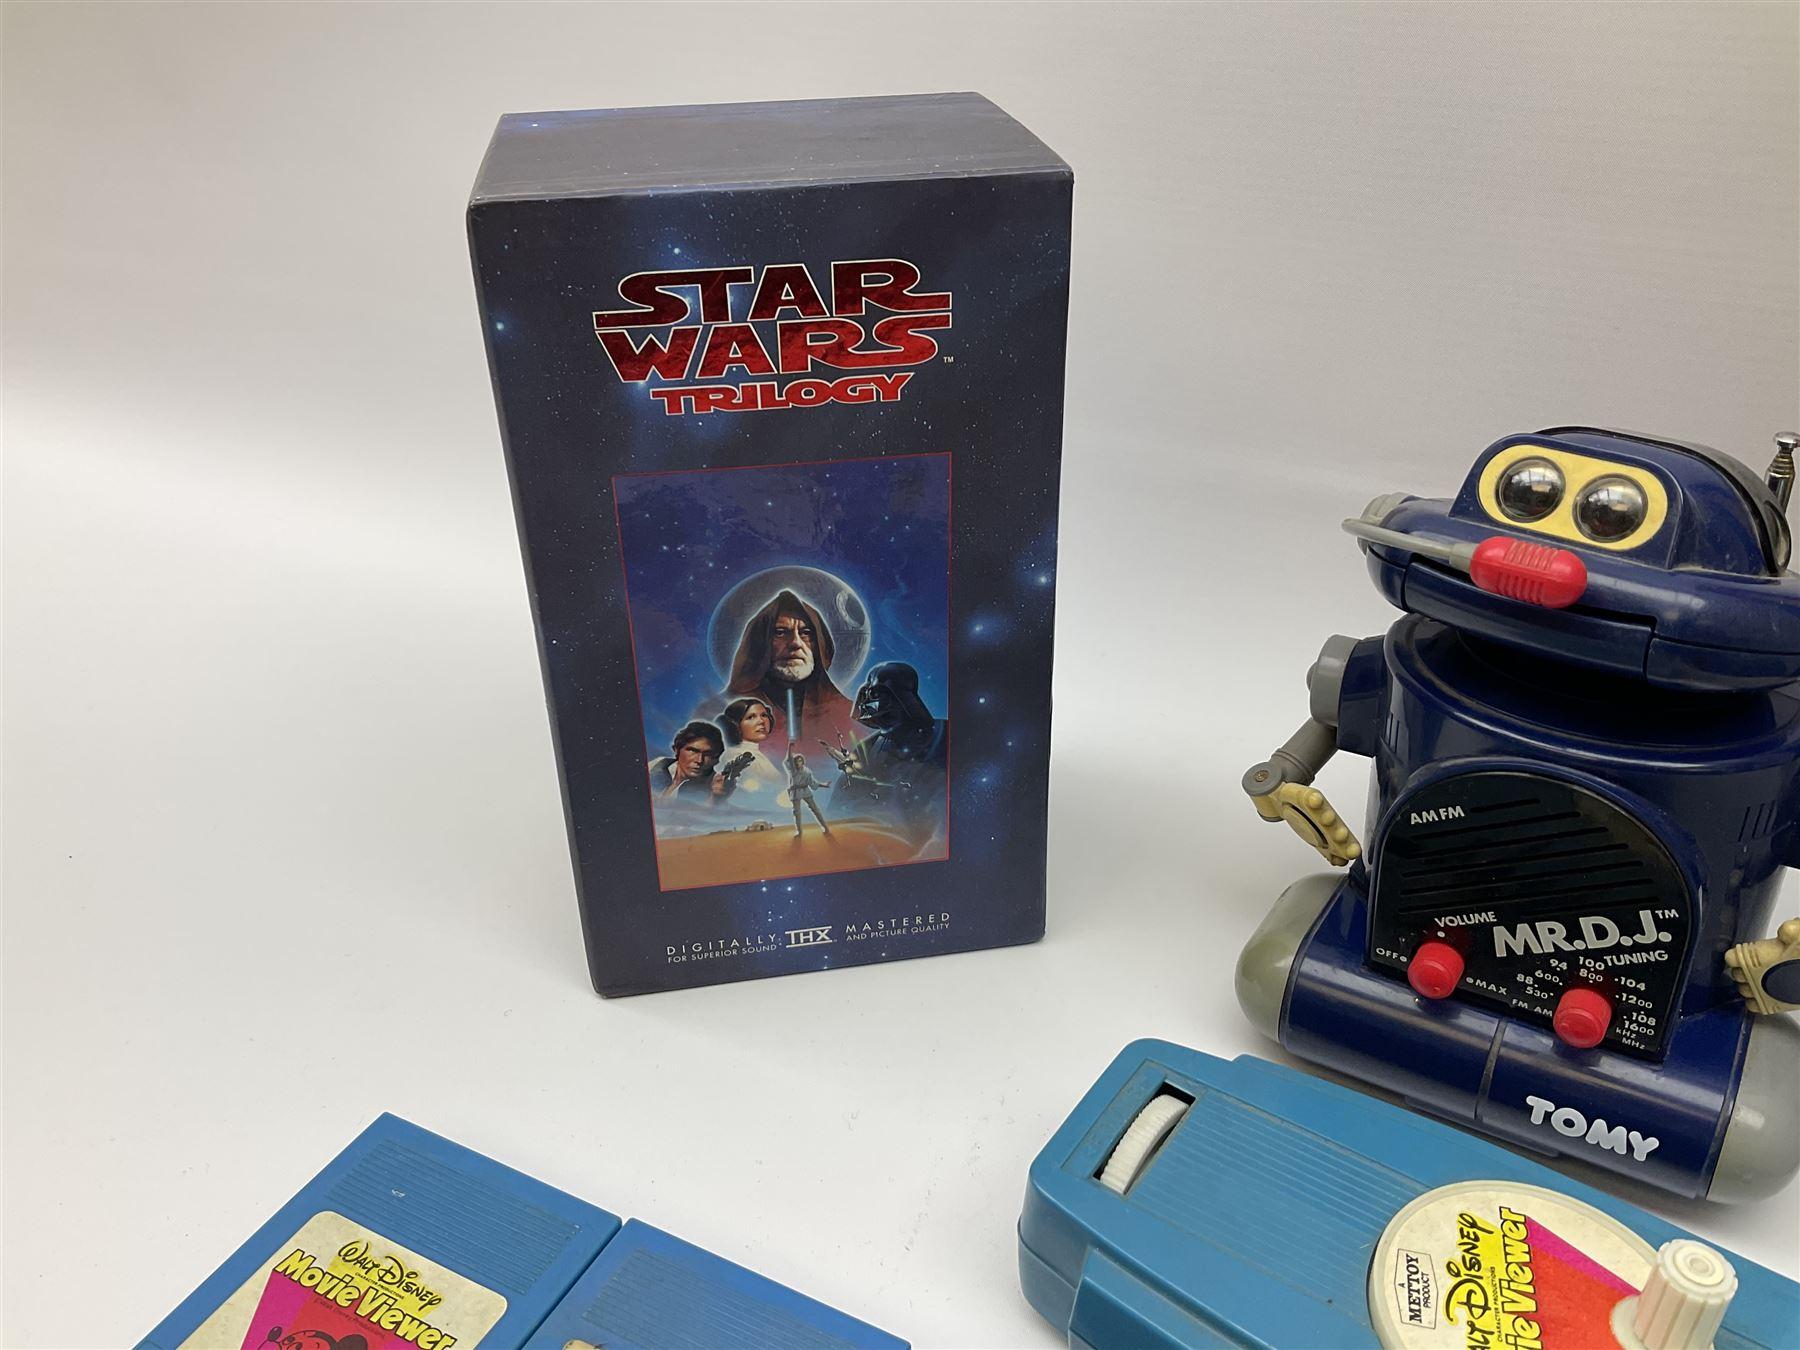 Matchbox 'The Thunderbirds' limited edition Commemorative Set - Image 4 of 7